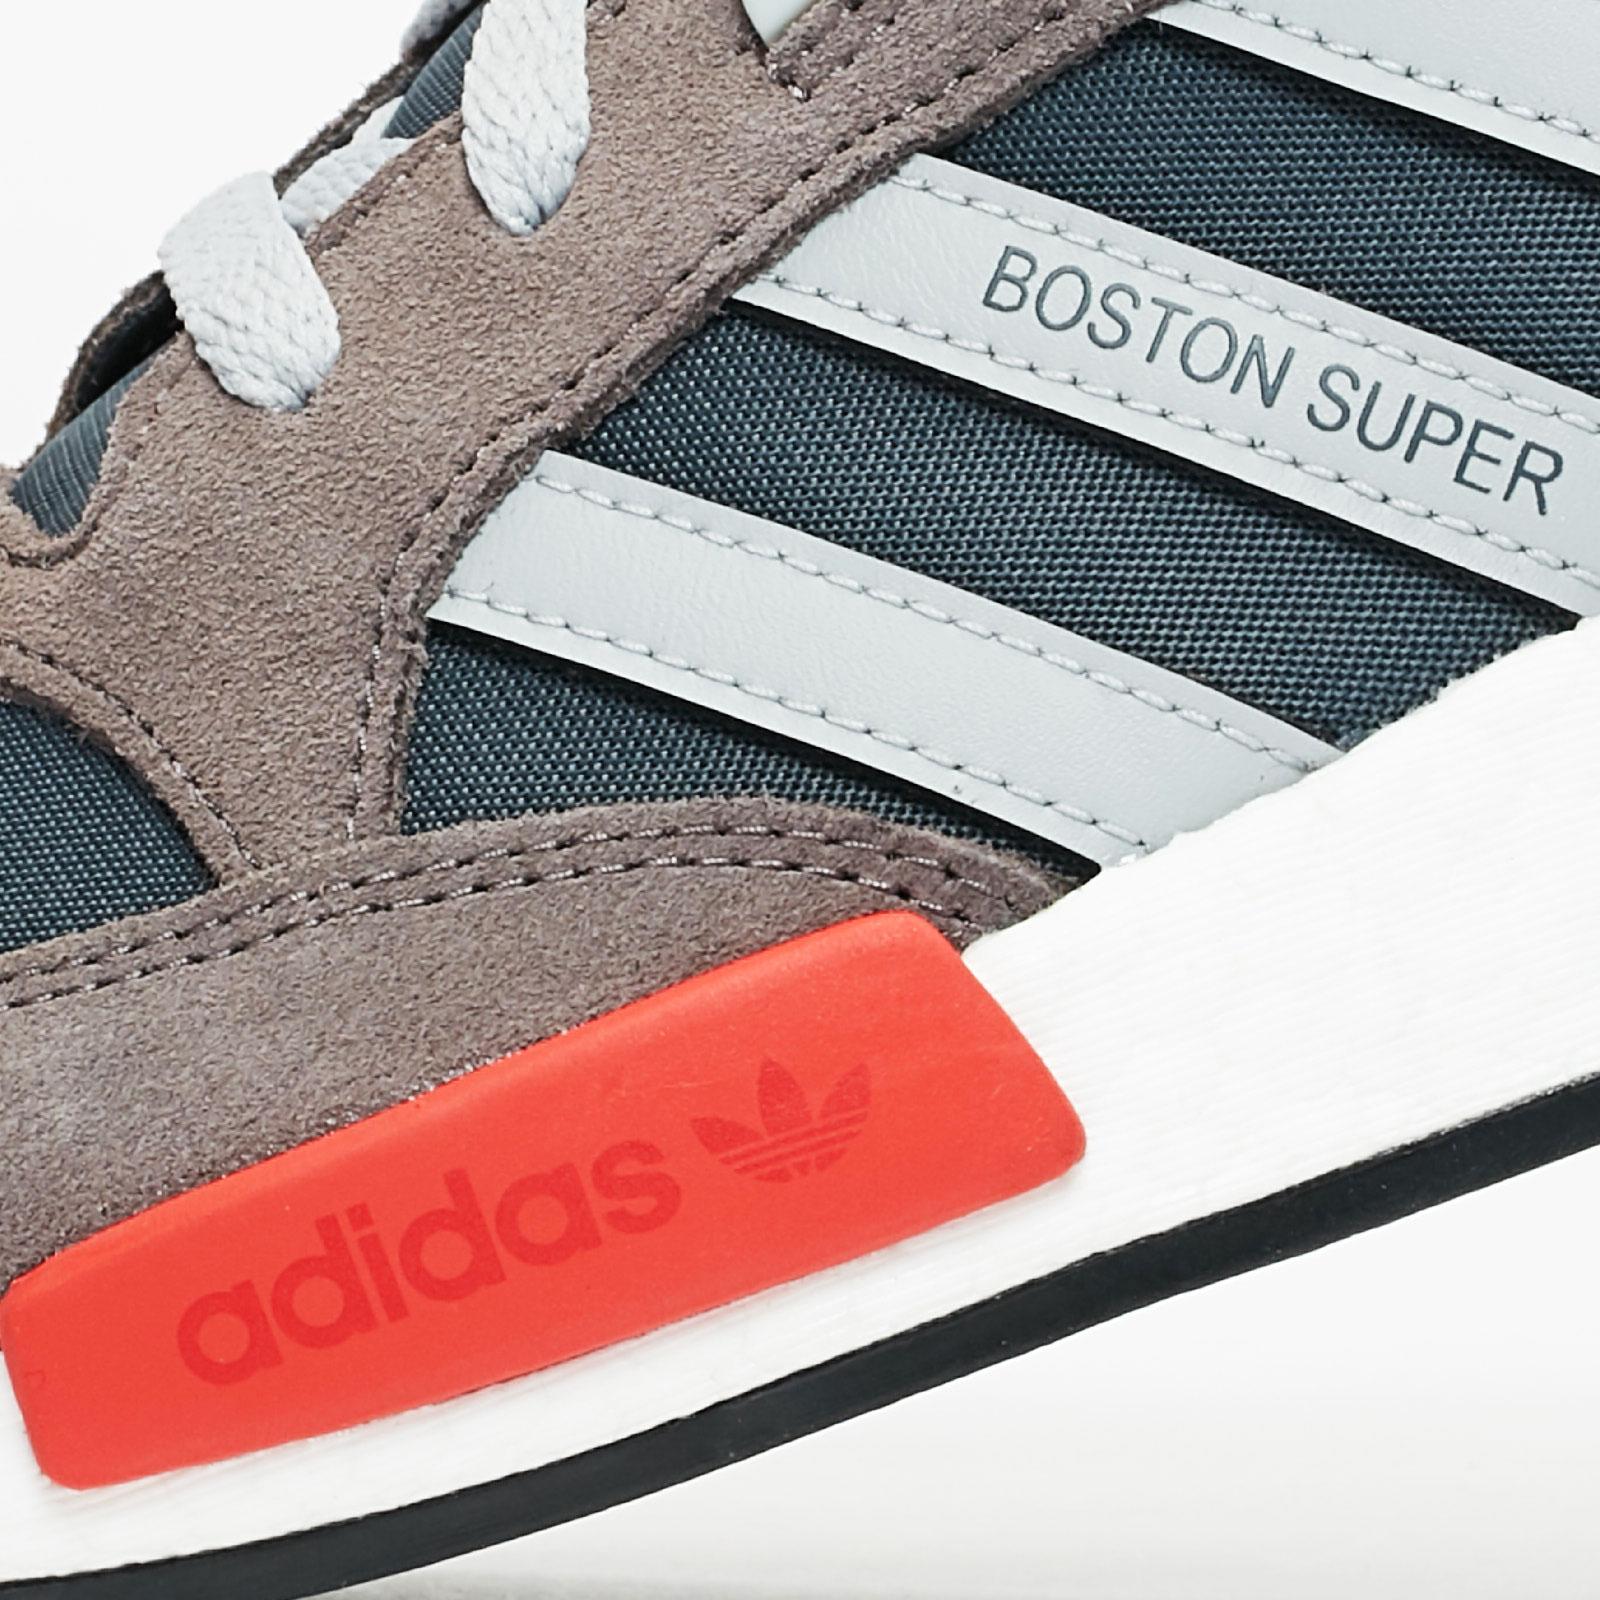 adidas Boston Super x R1 G26776 Sneakersnstuff